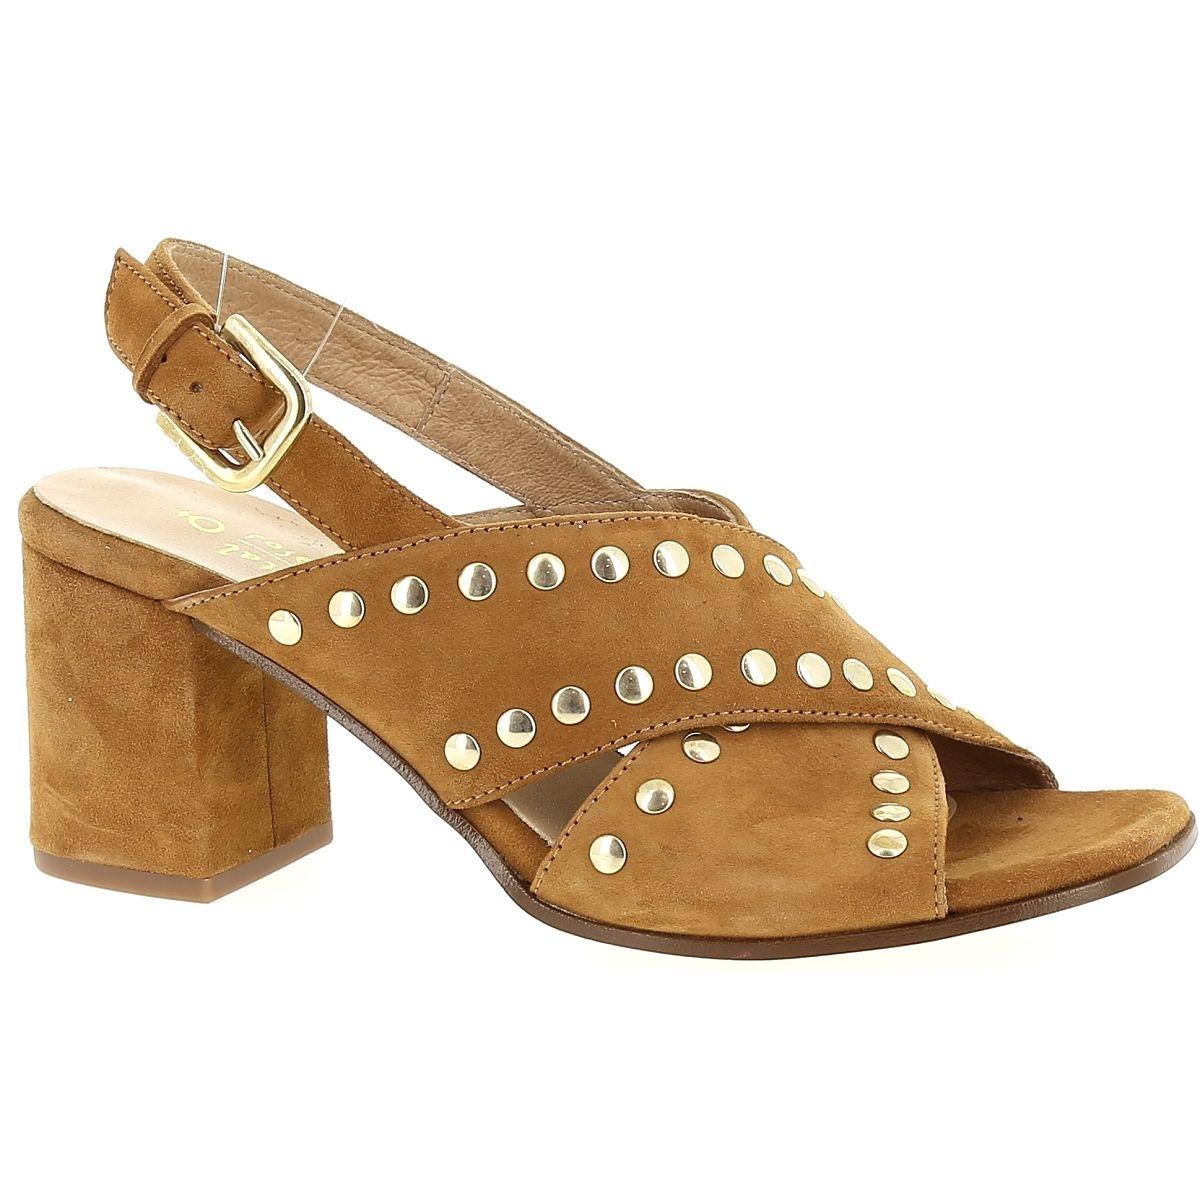 Sandales et nu-pieds - ROSEMETAL J1437G 8Pvar